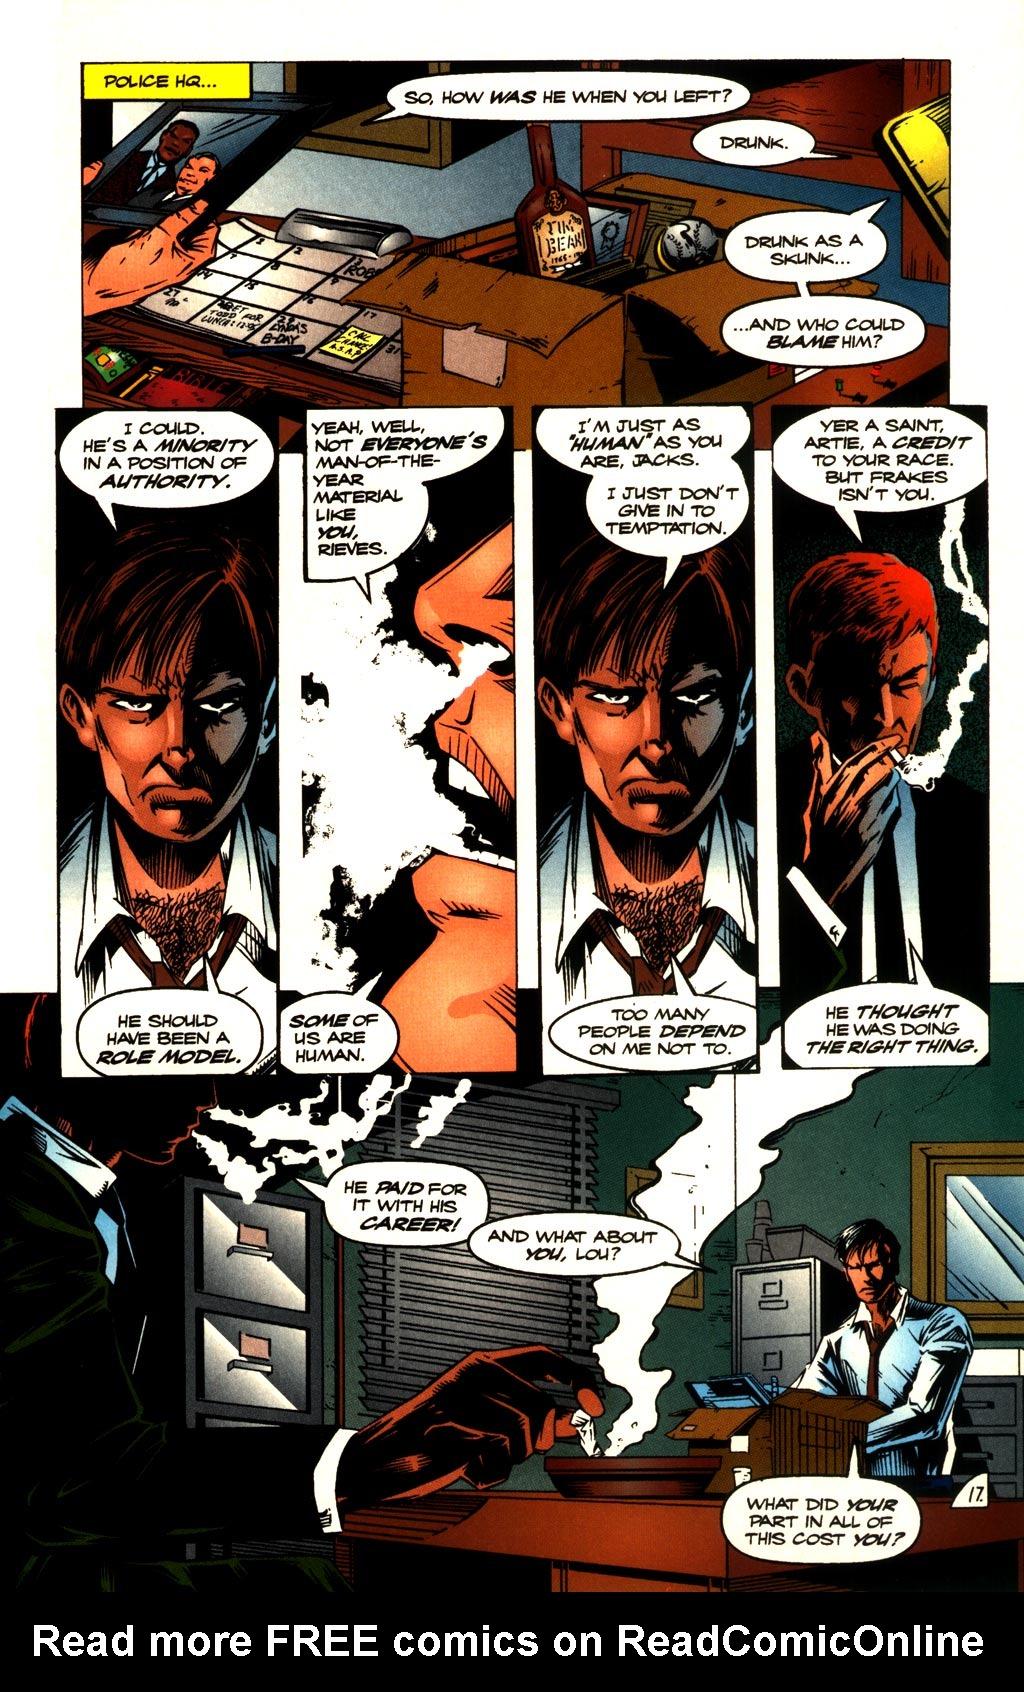 Read online ShadowHawk comic -  Issue #10 - 19